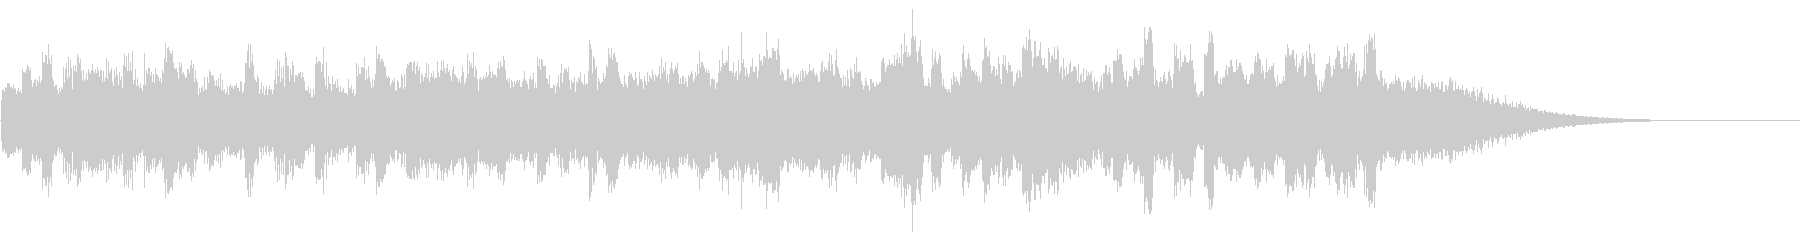 KANTBGM_piano緊迫感2の未再生の波形